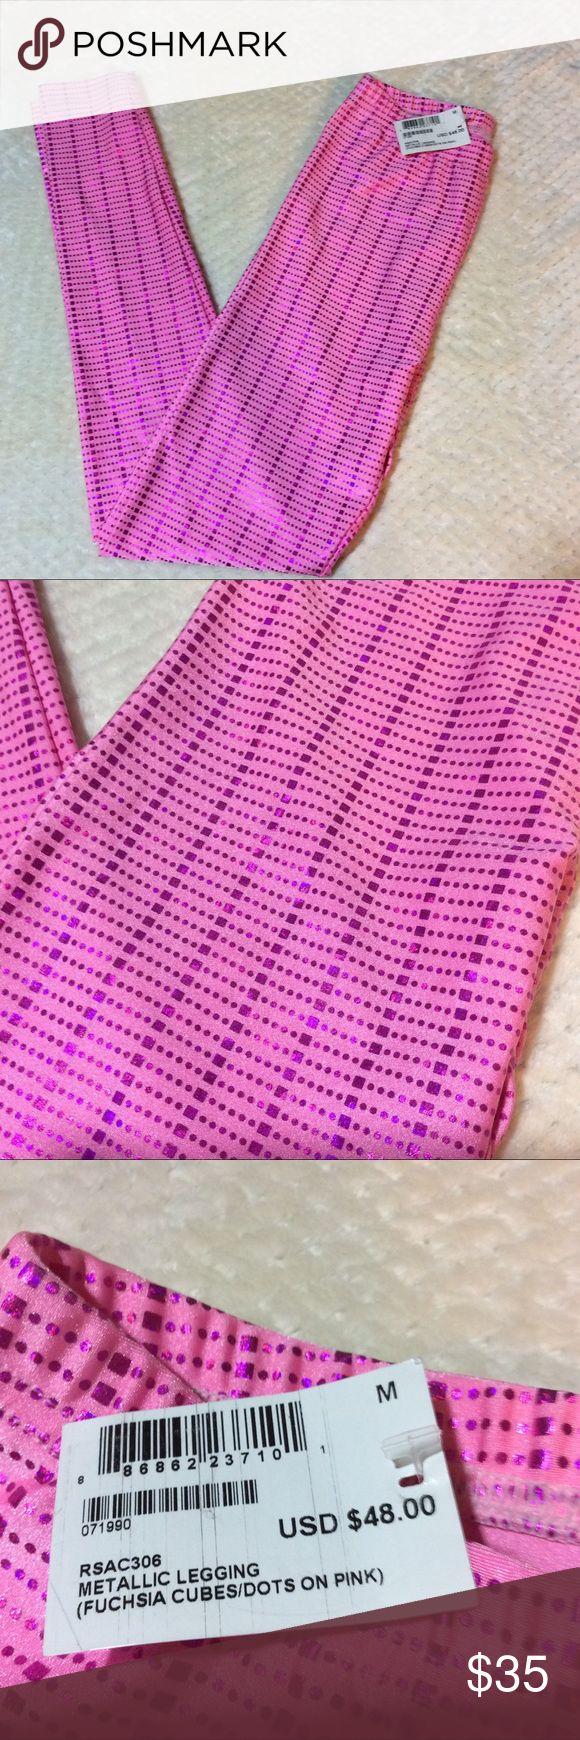 NWT American Apparel metallic legging. NWT American Apparel metallic legging. Size M. Color : Fuchsia cubes/dots on pink. American Apparel Pants Leggings